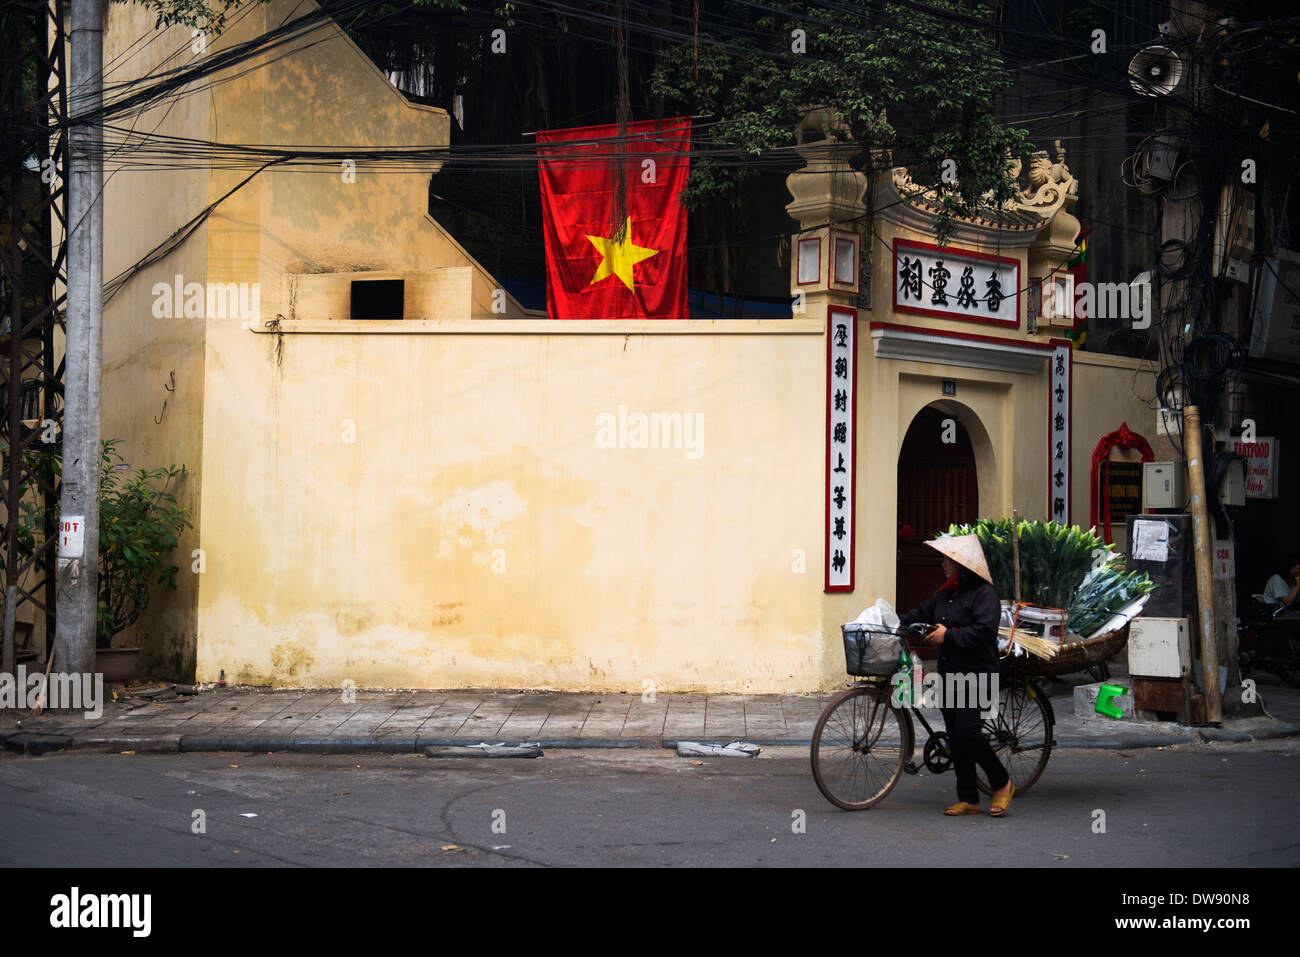 The colorful old quarter of Hanoi, Vietnam. - Stock Image